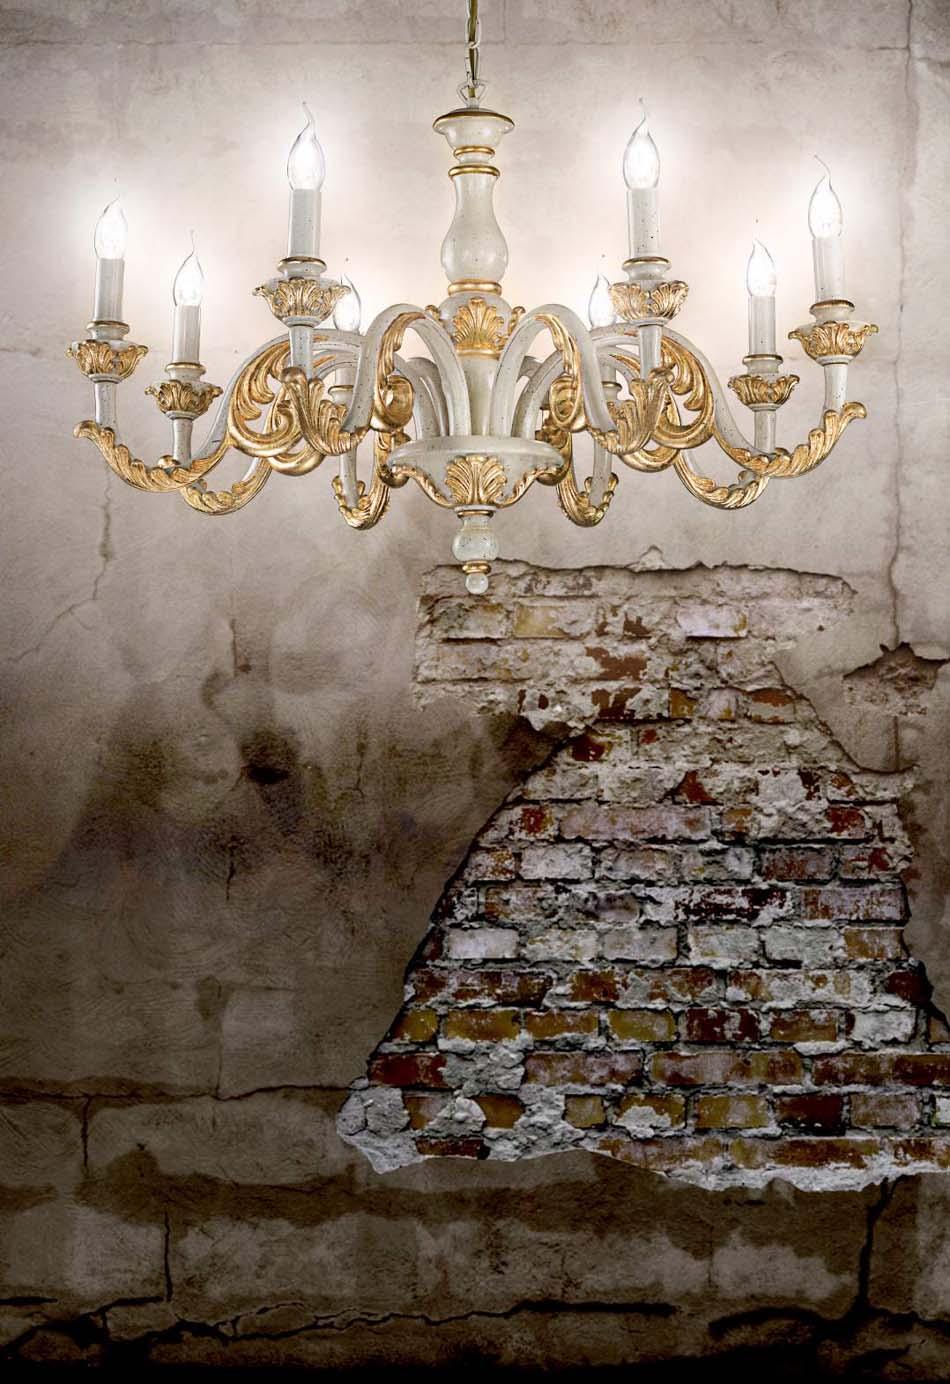 Lampade 53 sospese vintage Ideal Lux Giglio – Toscana Arredamenti